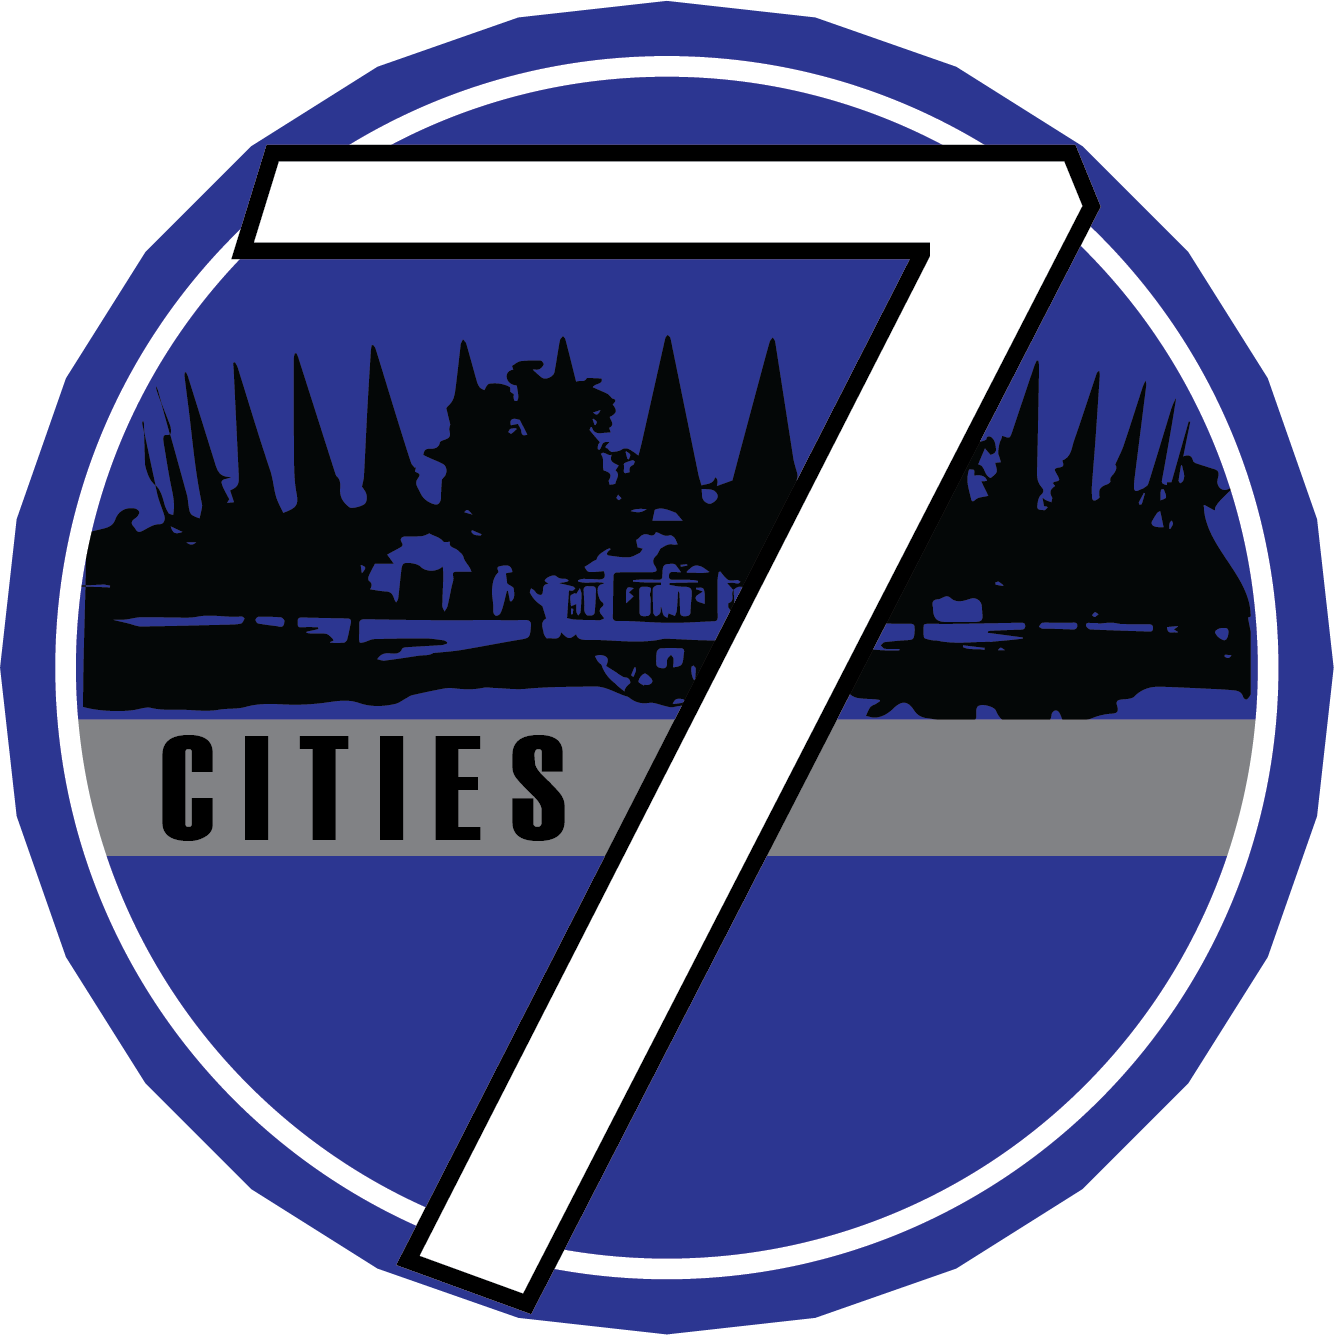 7 CITIES INSTAGRAM PRESSURE WASHING LOGO MOCKUP V1.1.1.png